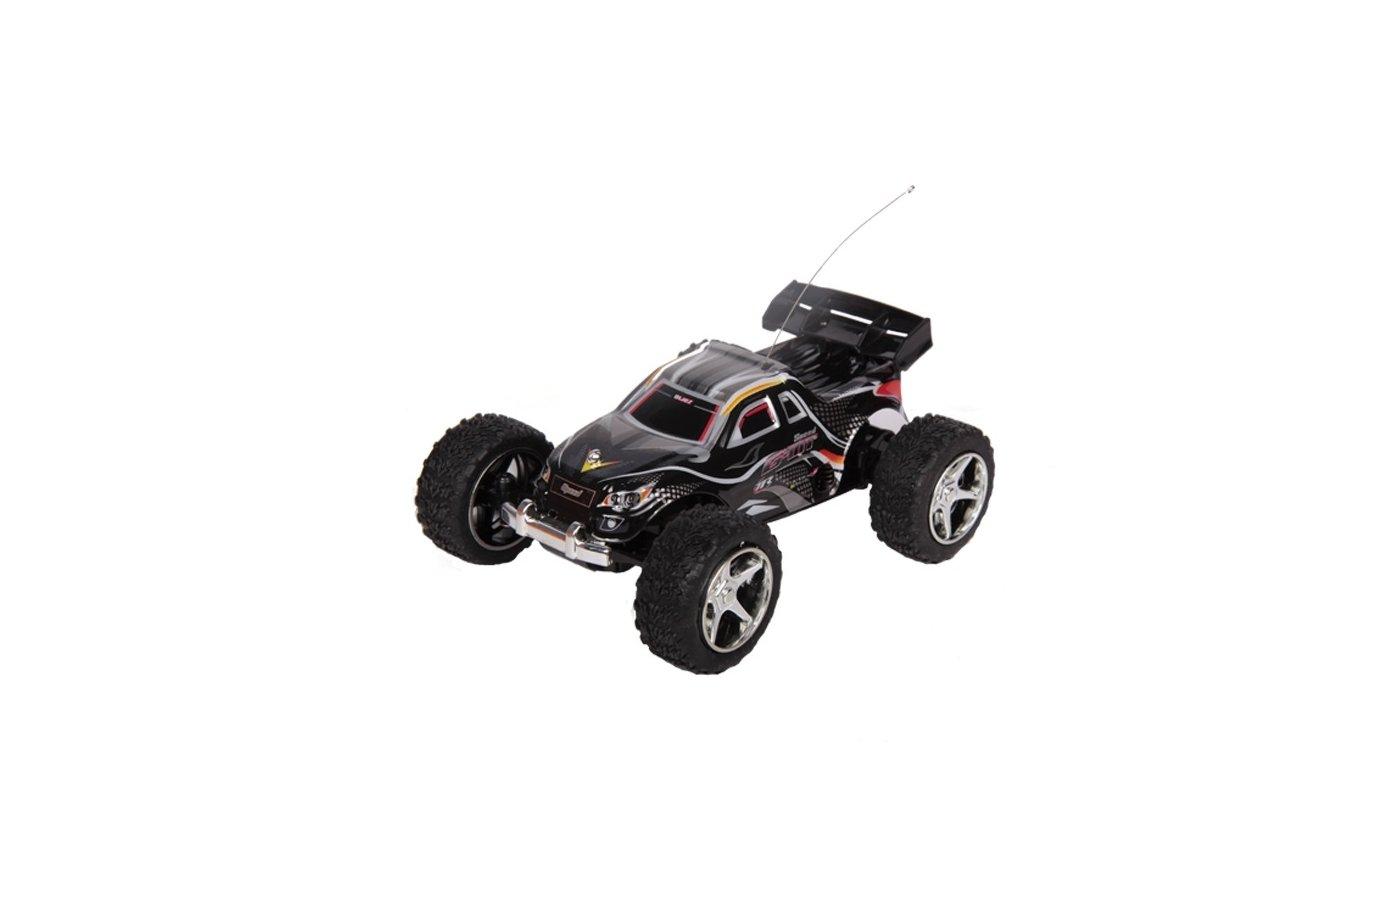 Игрушка WL Toys Speed Racer автомобиль